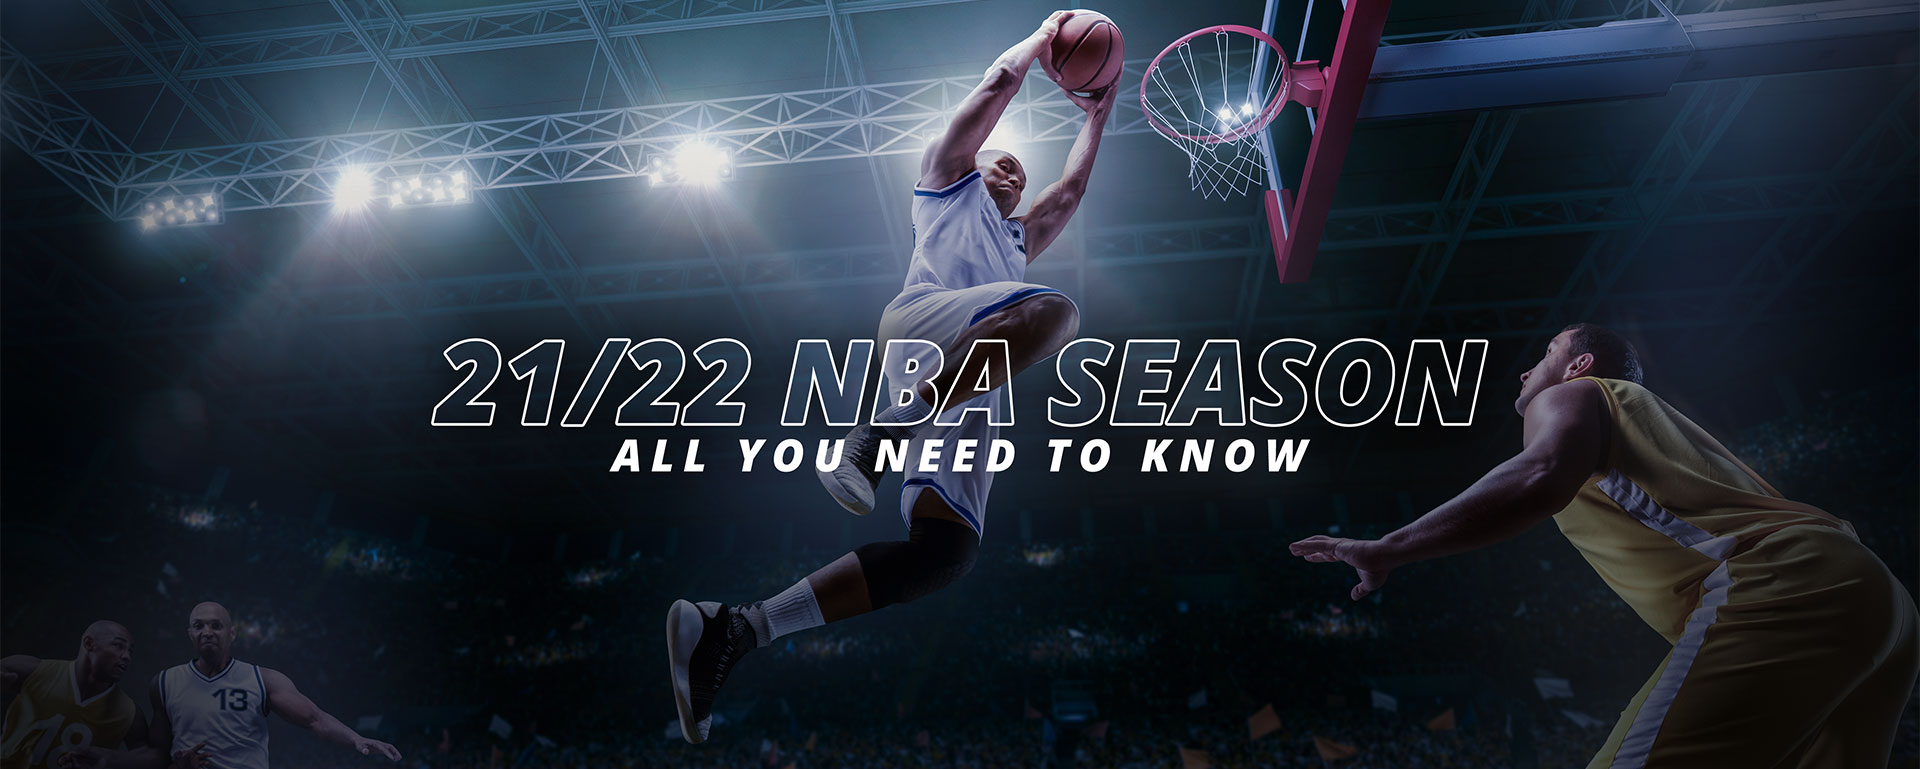 2021/22 NBA SEASON: ALL YOU NEED TO KNOW